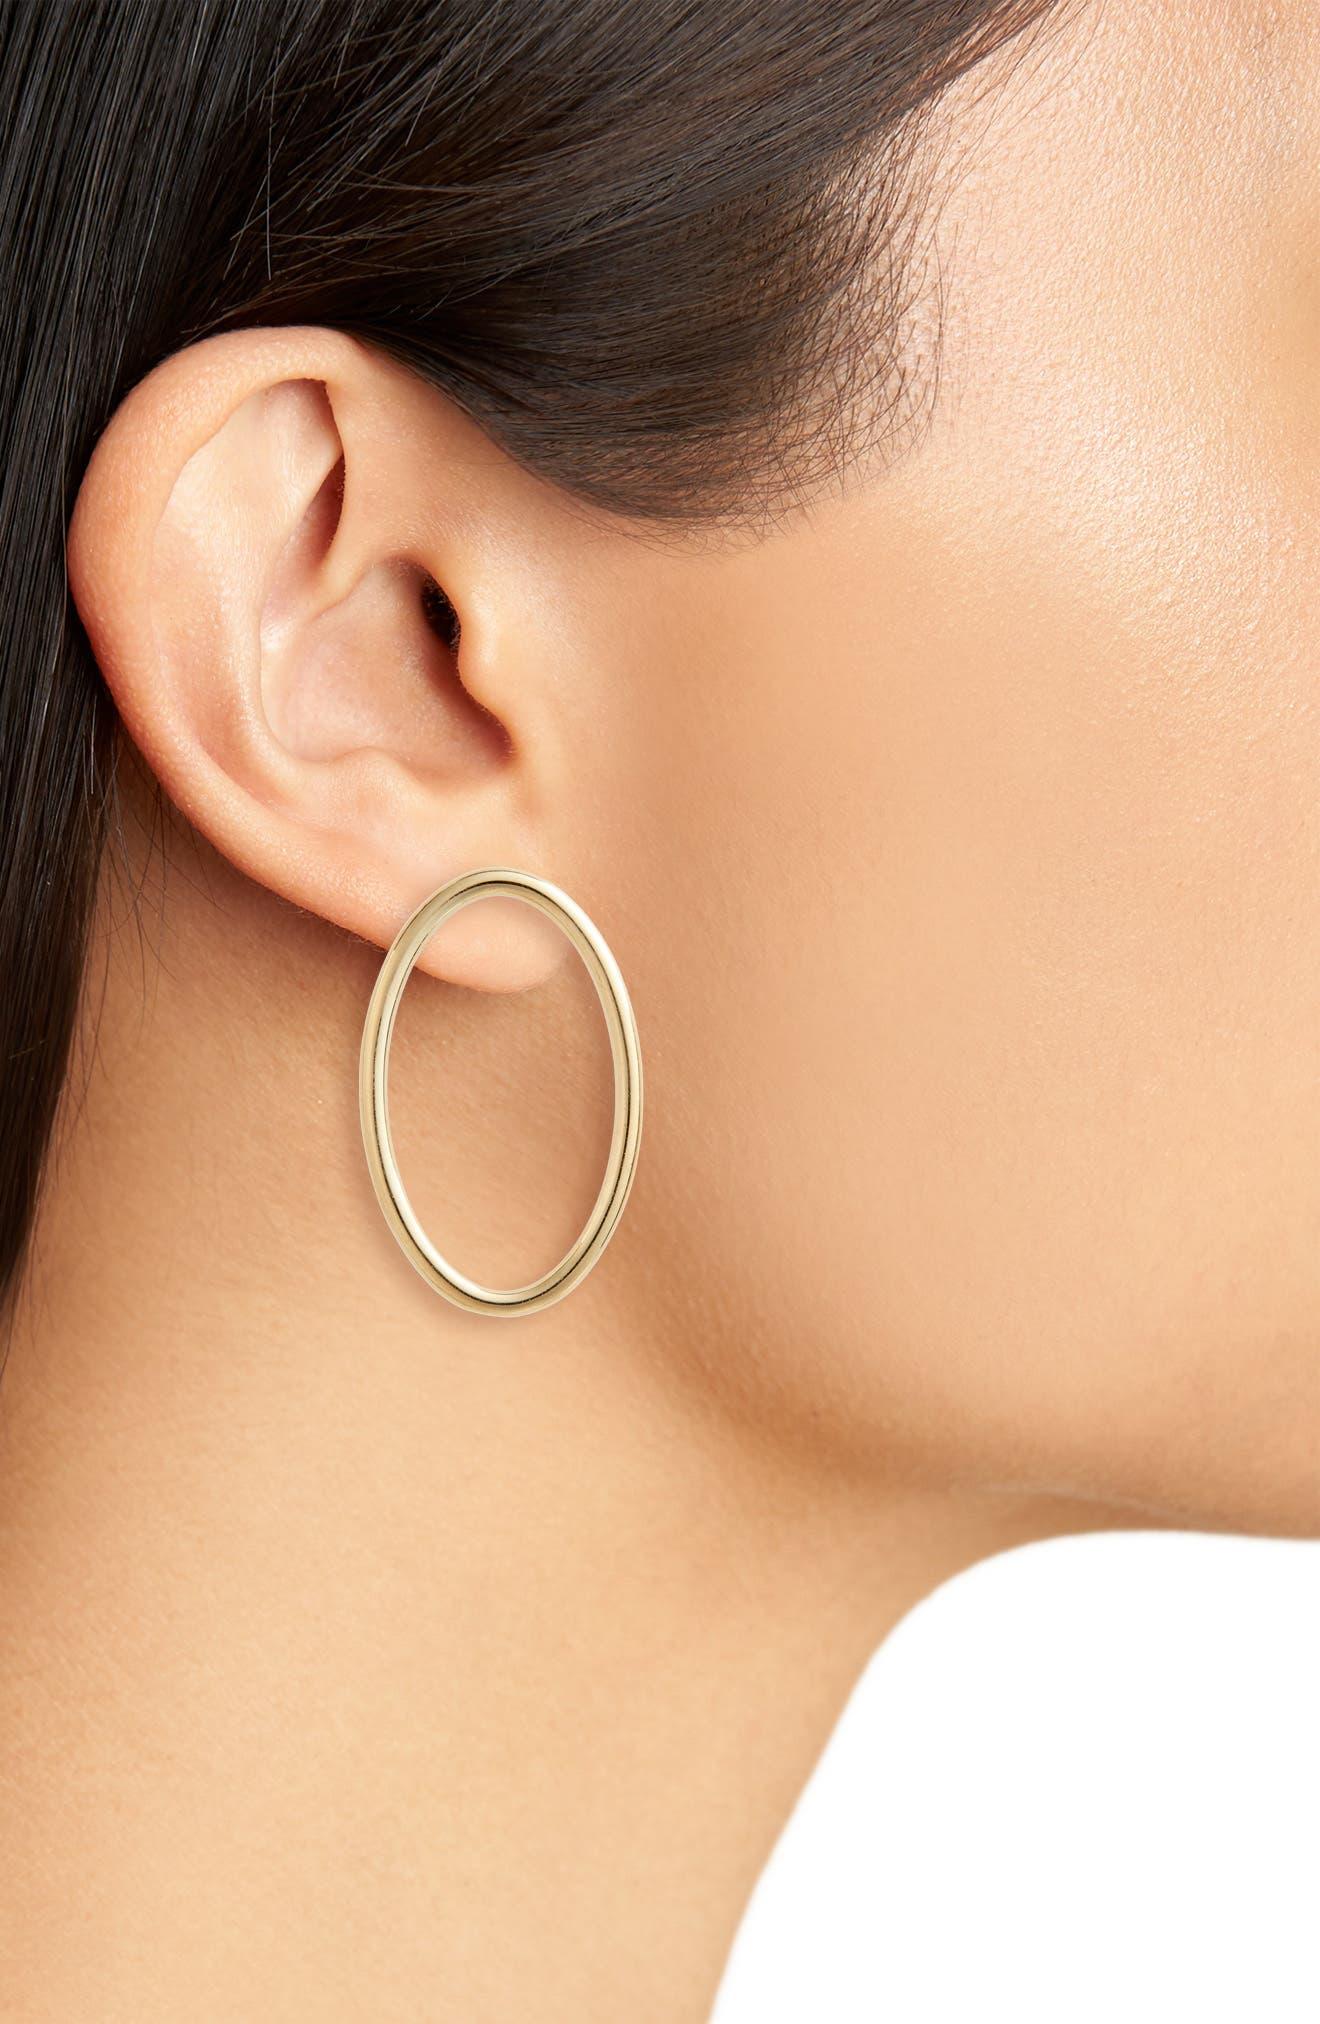 Large Ellipse Polished Vermeil Earrings,                             Alternate thumbnail 2, color,                             POLISHED VERMEIL